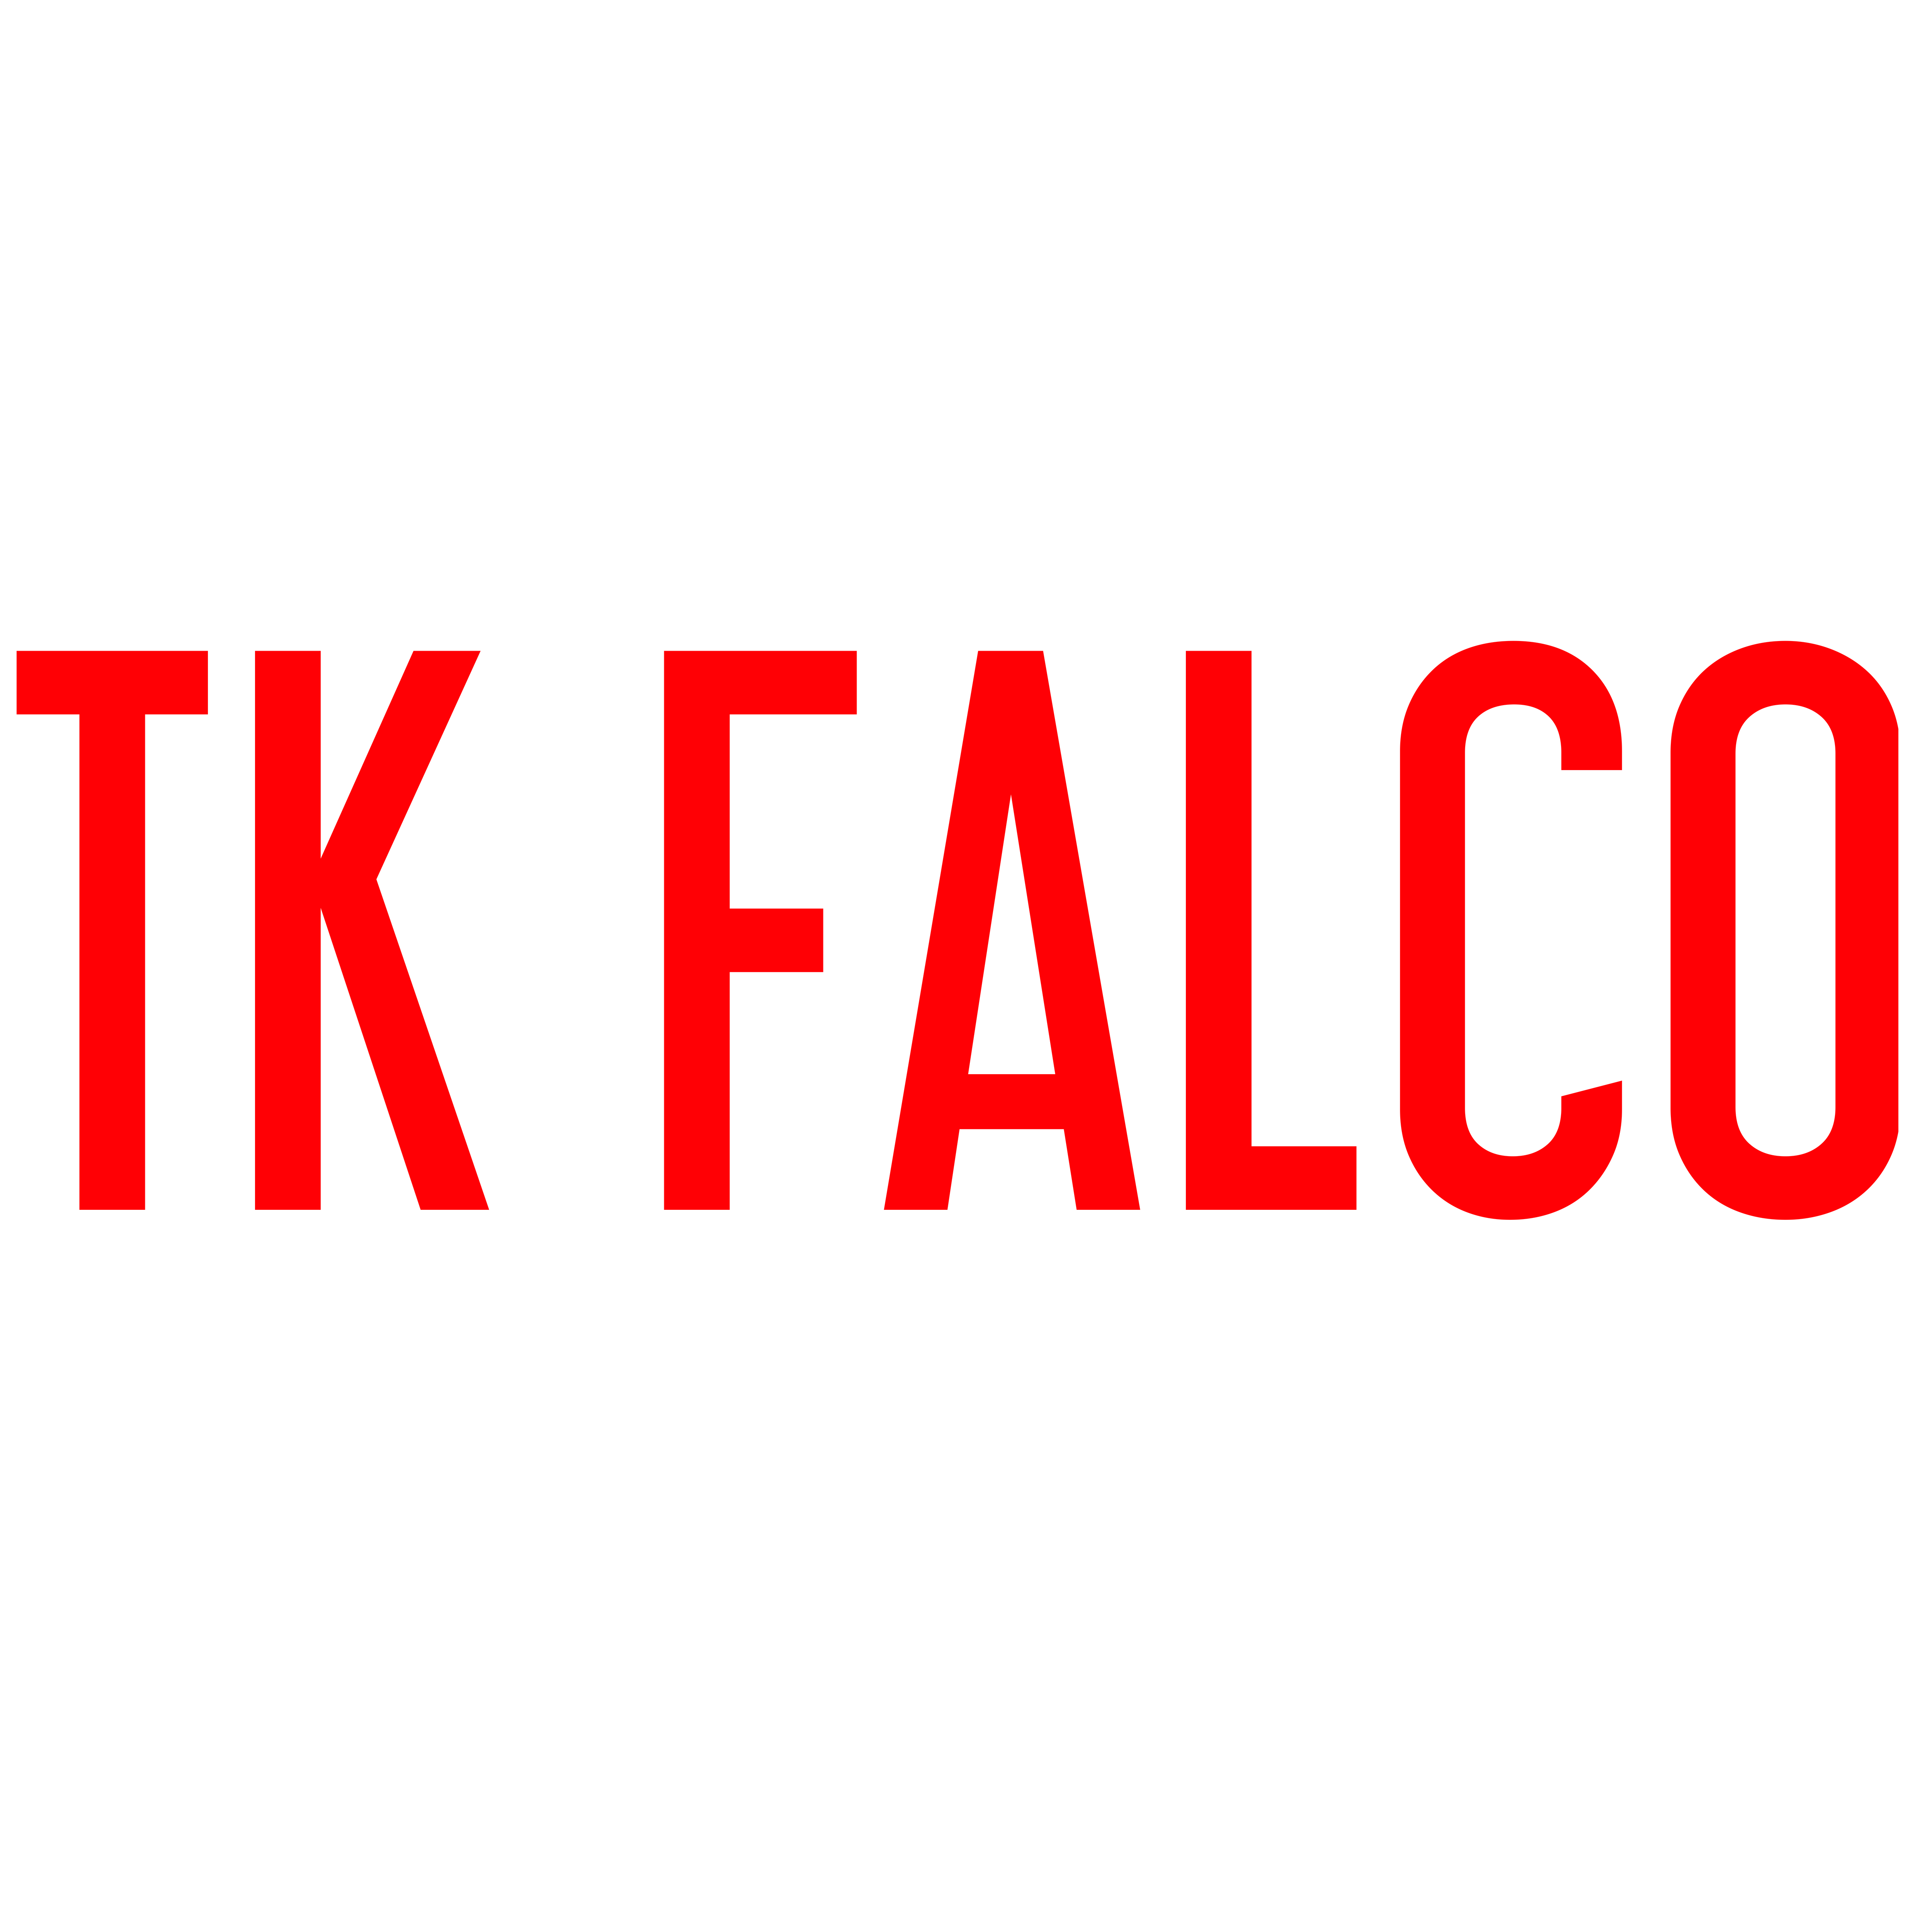 T.K. Falco